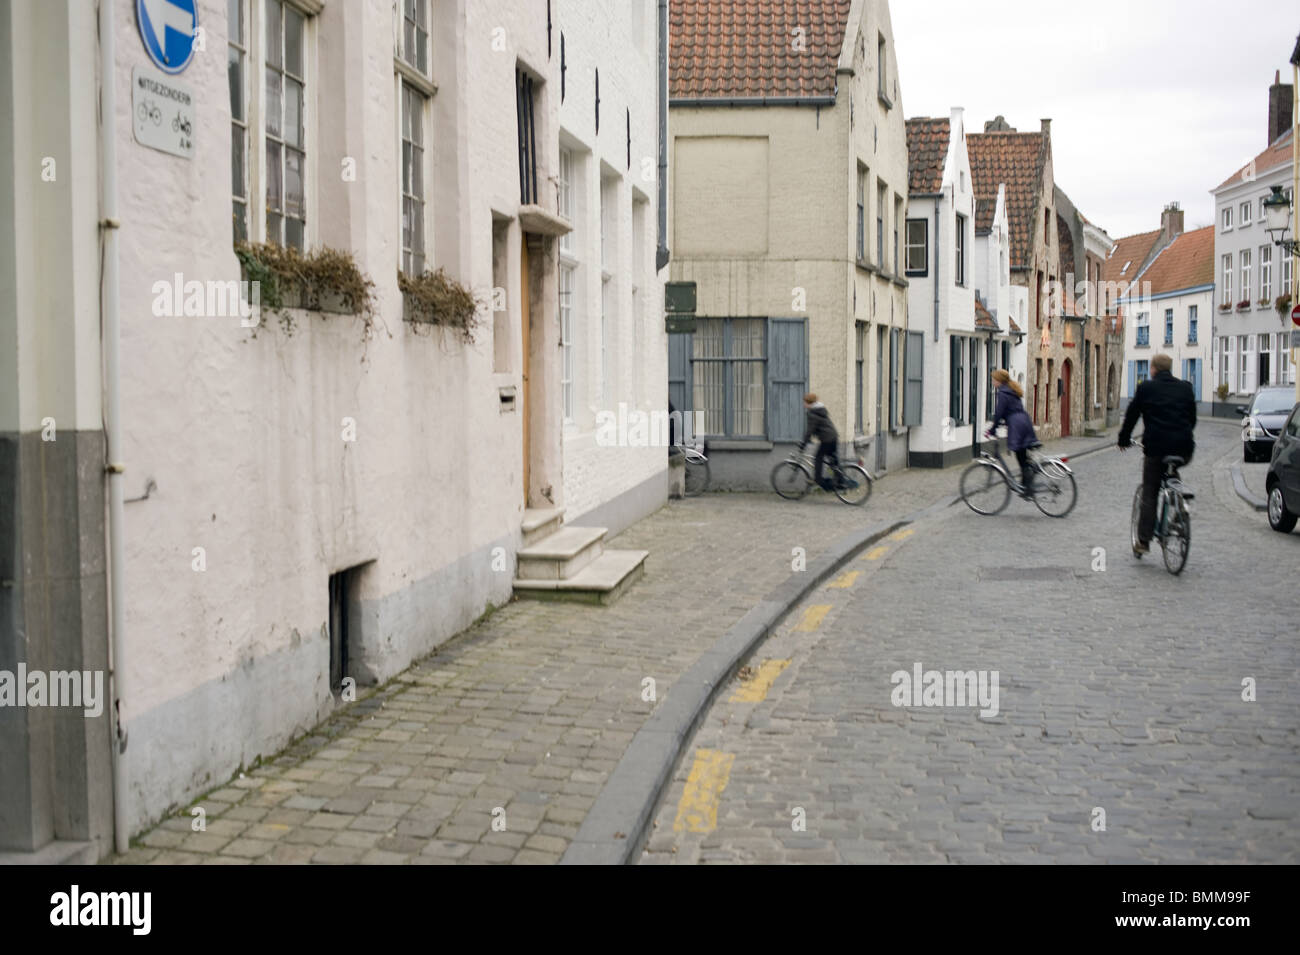 4 vélos alignés, courbe, virage, famille à vélo, ville allineare 4 biciclette, curva, piegare, Immagini Stock